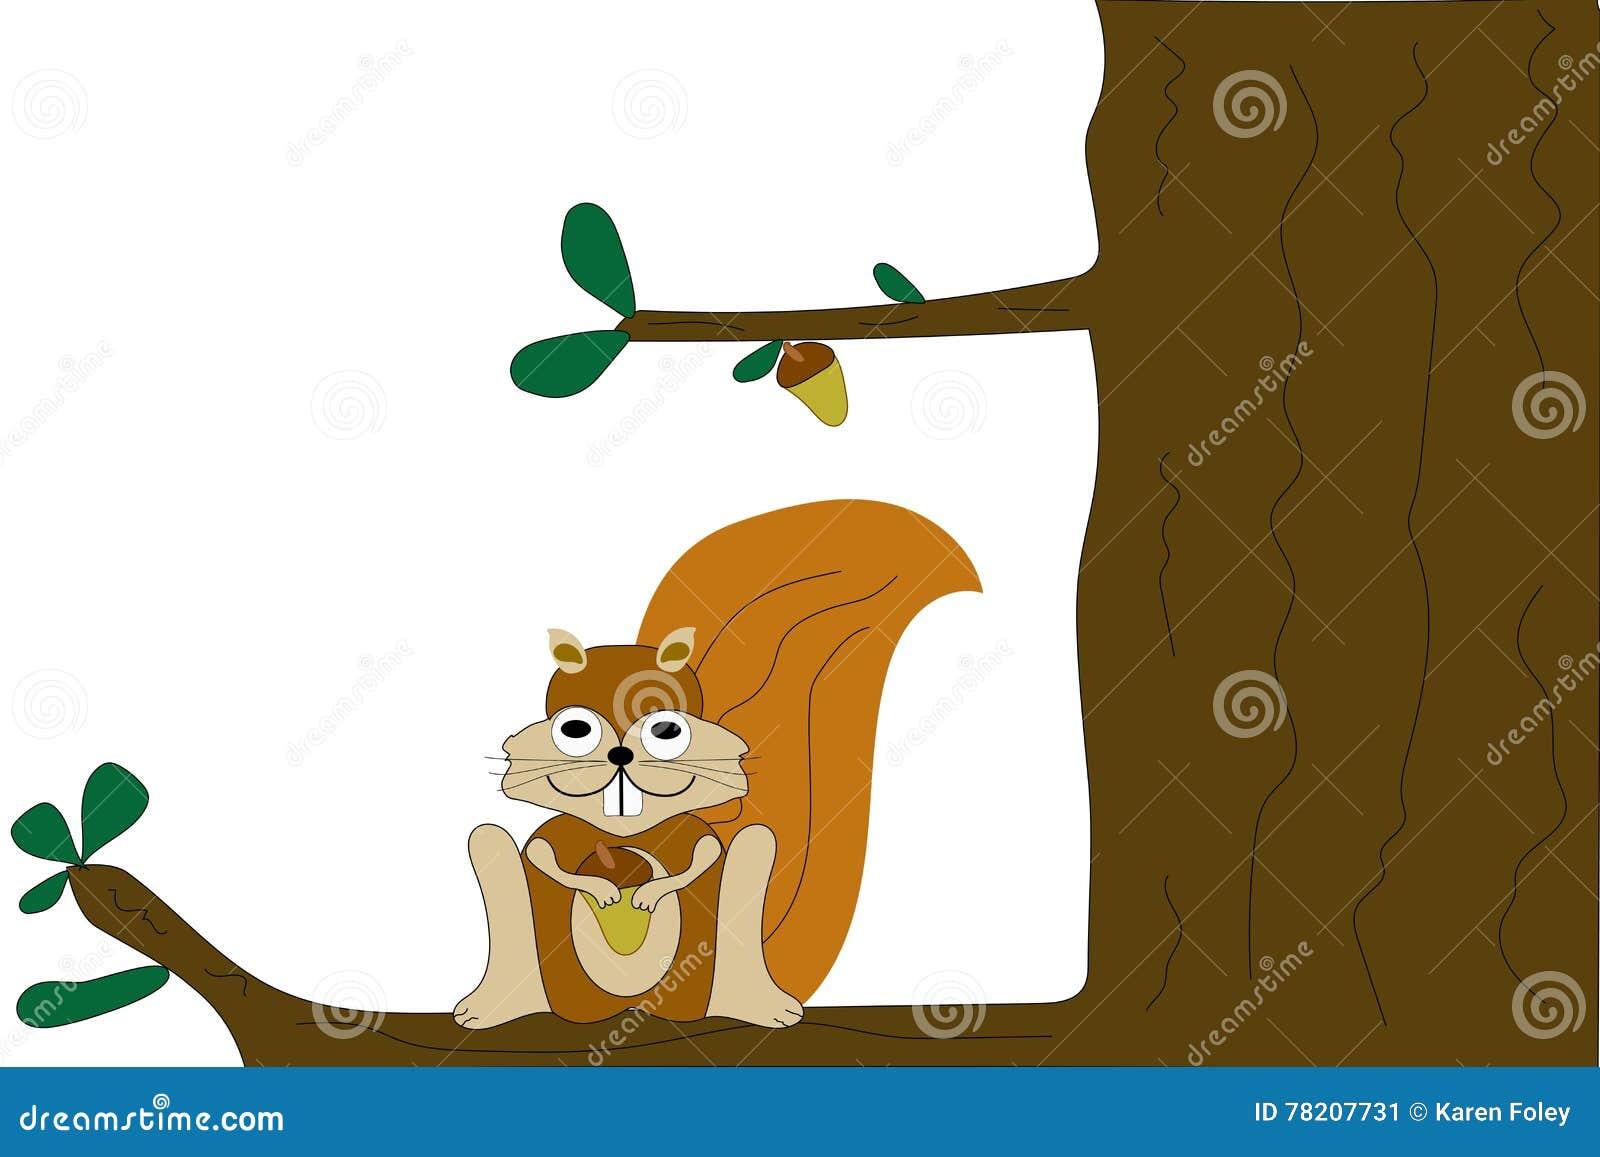 Squirrel Tree Limb Stock Illustrations 4 Squirrel Tree Limb Stock Illustrations Vectors Clipart Dreamstime 50,000+ vectors, stock photos & psd files. squirrel tree limb stock illustrations 4 squirrel tree limb stock illustrations vectors clipart dreamstime